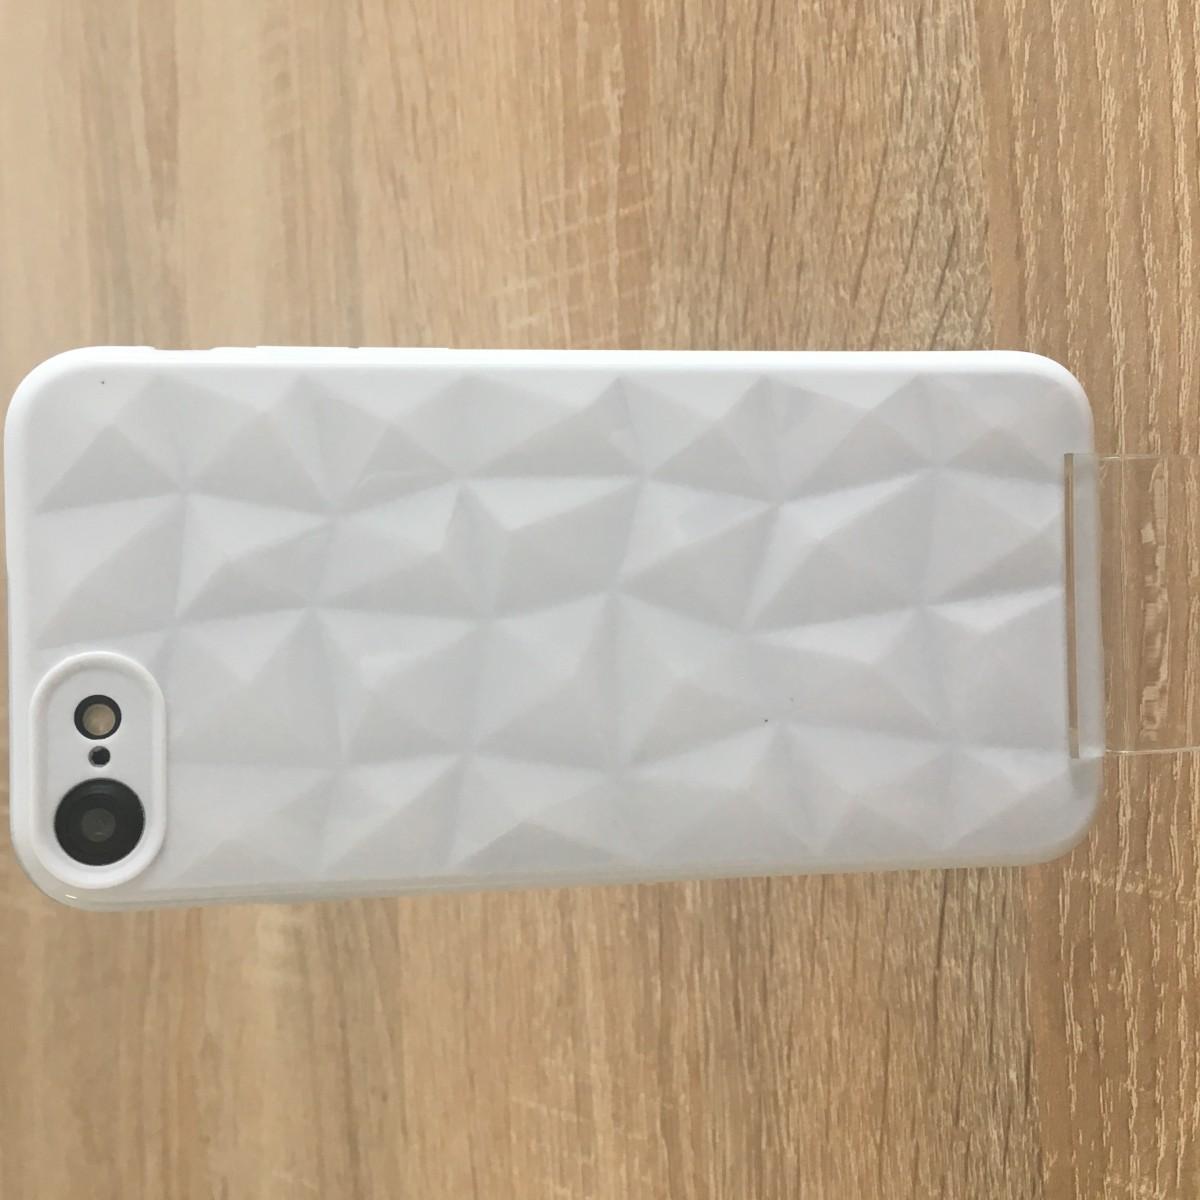 Pouzdro iMore Prism pro Apple iPhone 8/7 - bílé